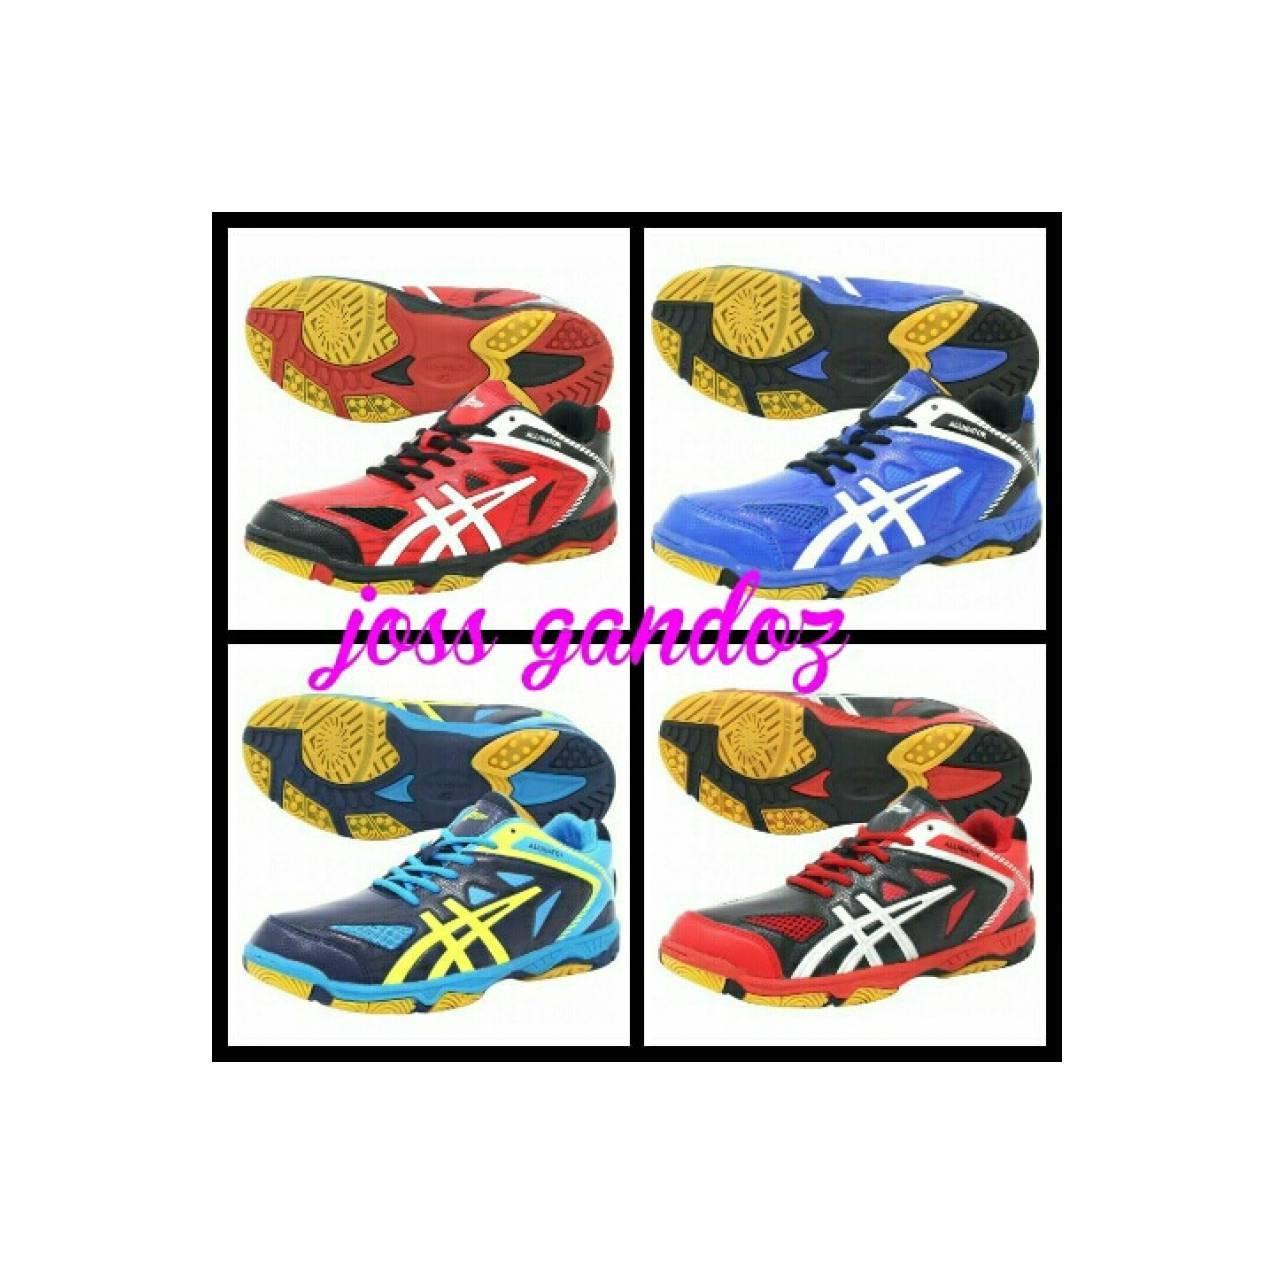 sepatu professional allig / badminton volley volly asics mizuno